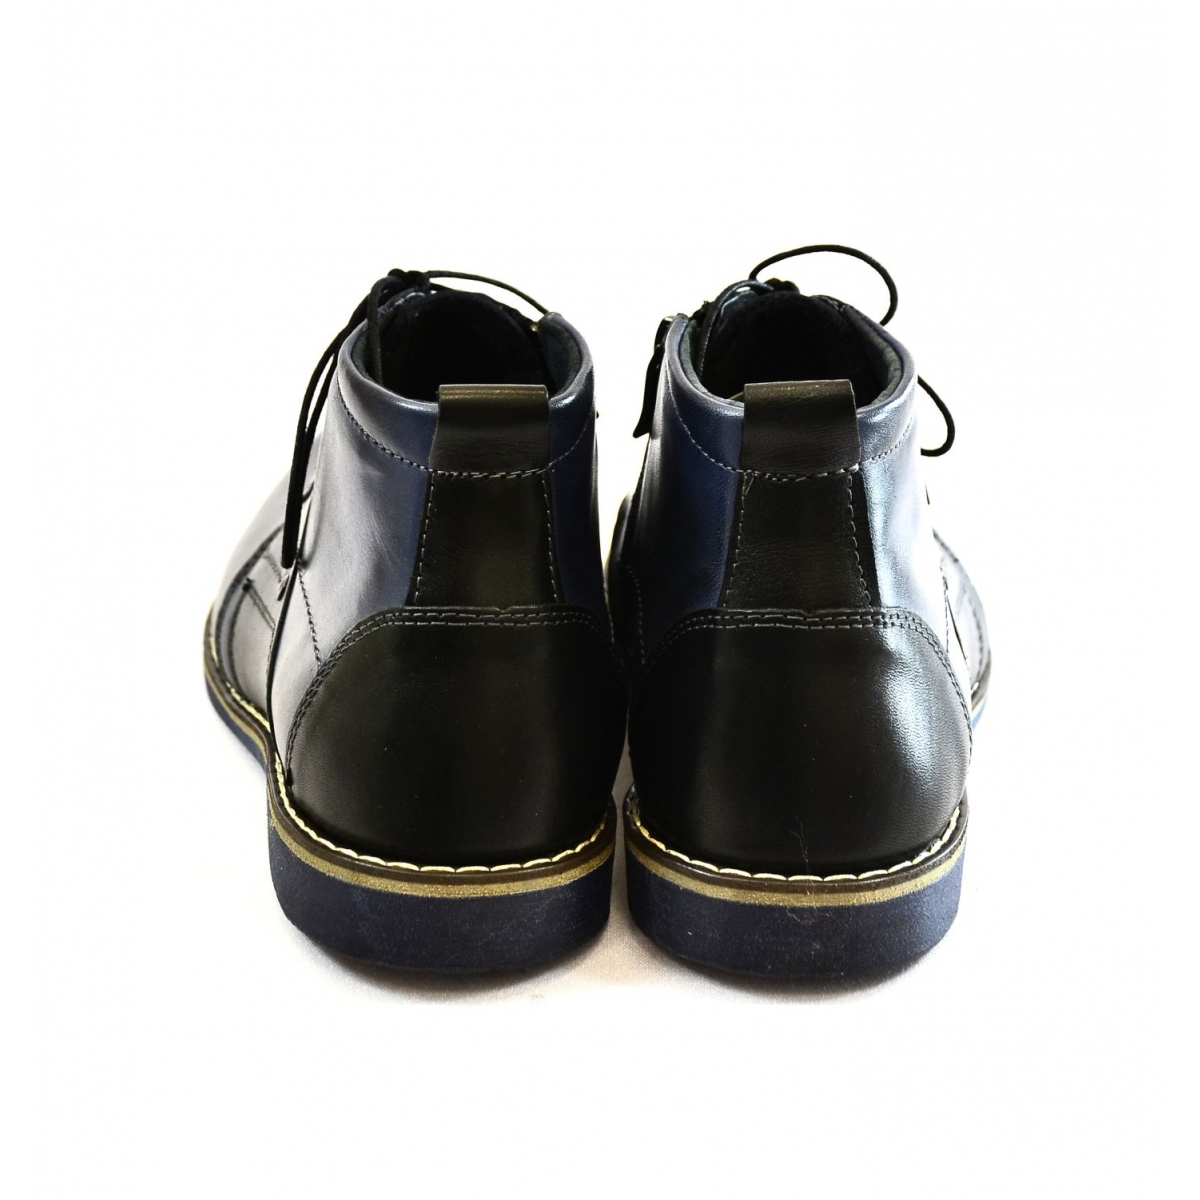 ee20c1bdd4 Pánske tmavo-modré kožené zimné topánky TRISTAN - 4